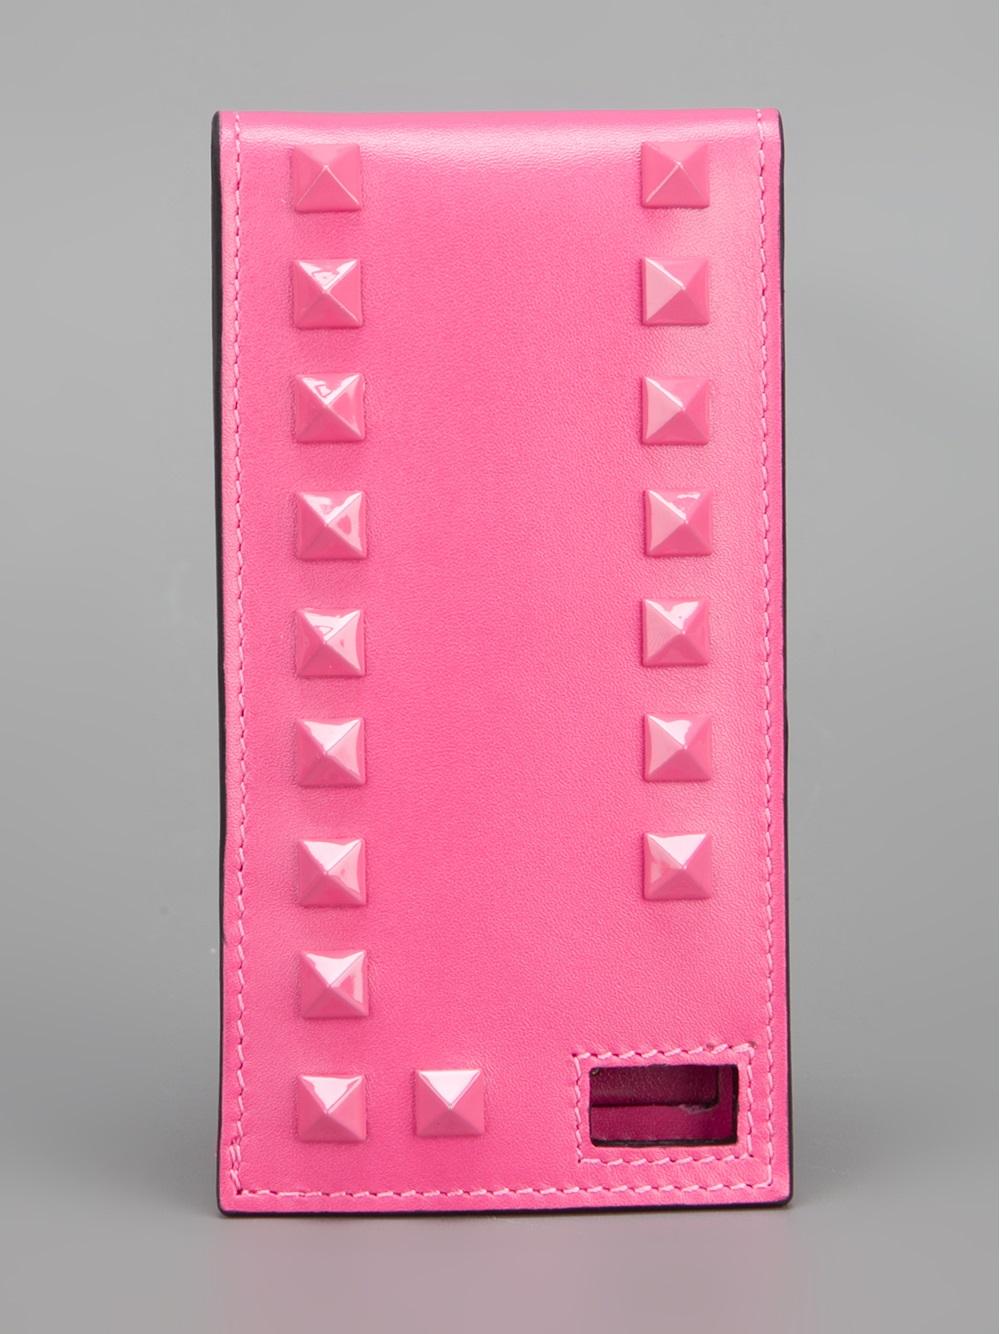 new styles 91de1 a809b Valentino Pink Rockstud Iphone Case